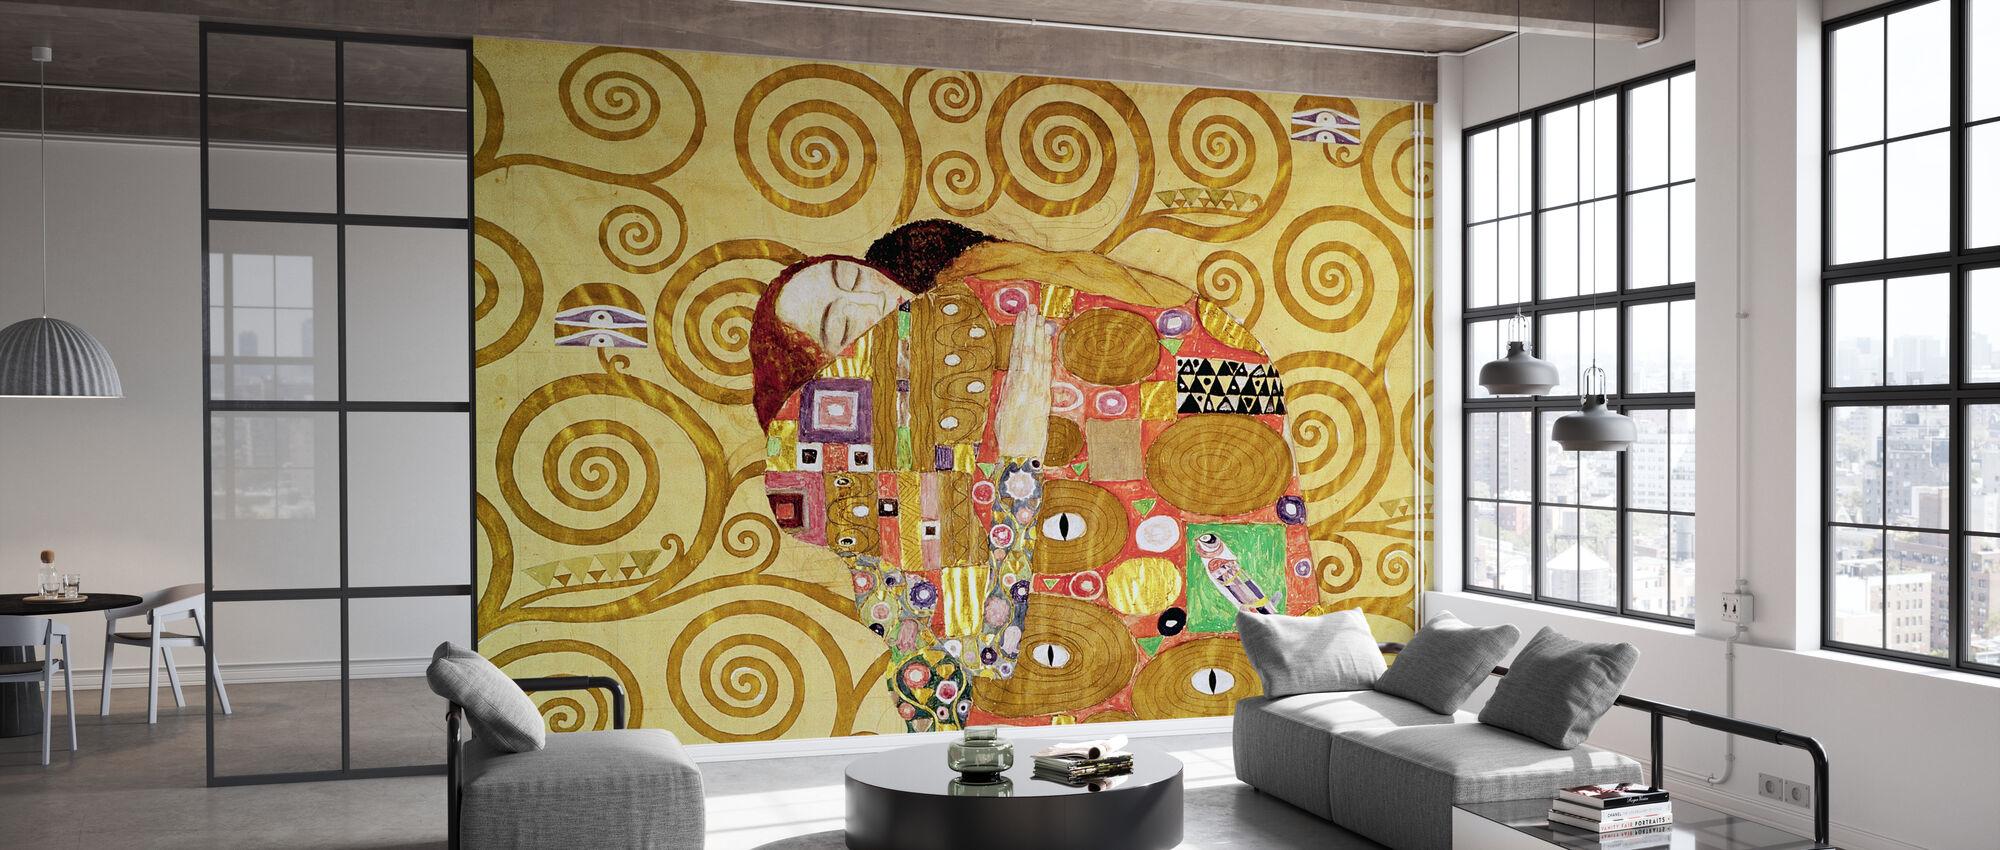 Fulfilment - Gustav Klimt - Wallpaper - Office